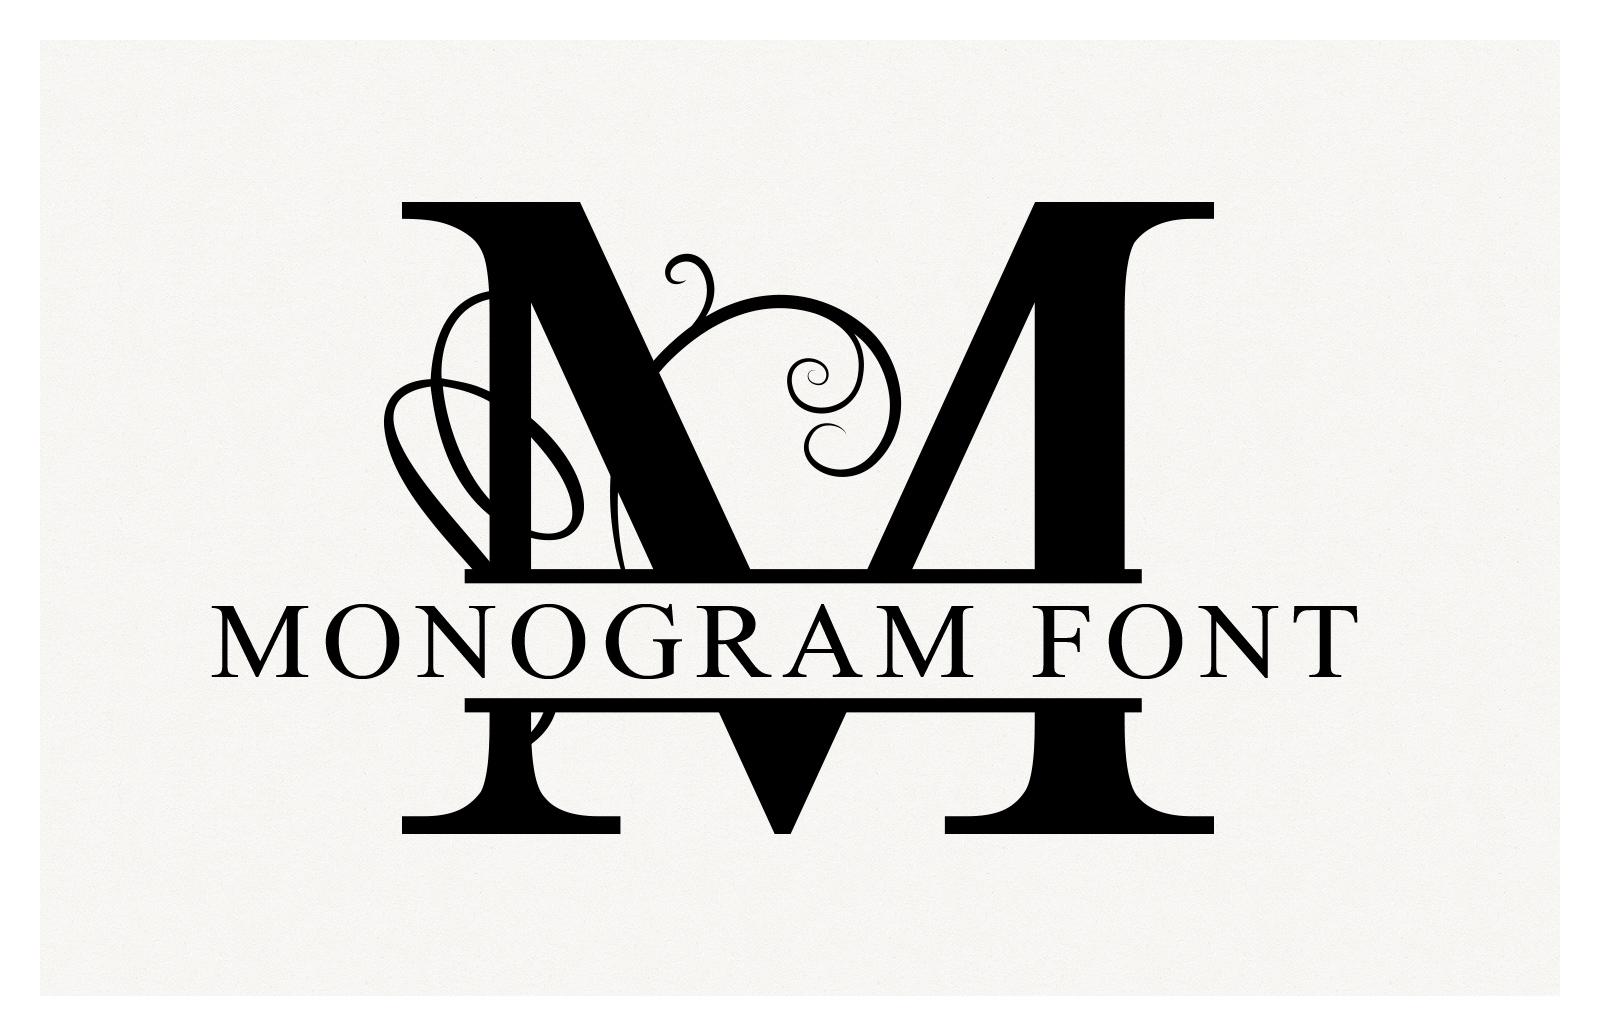 Split Monogram Font Vectors Preview 1